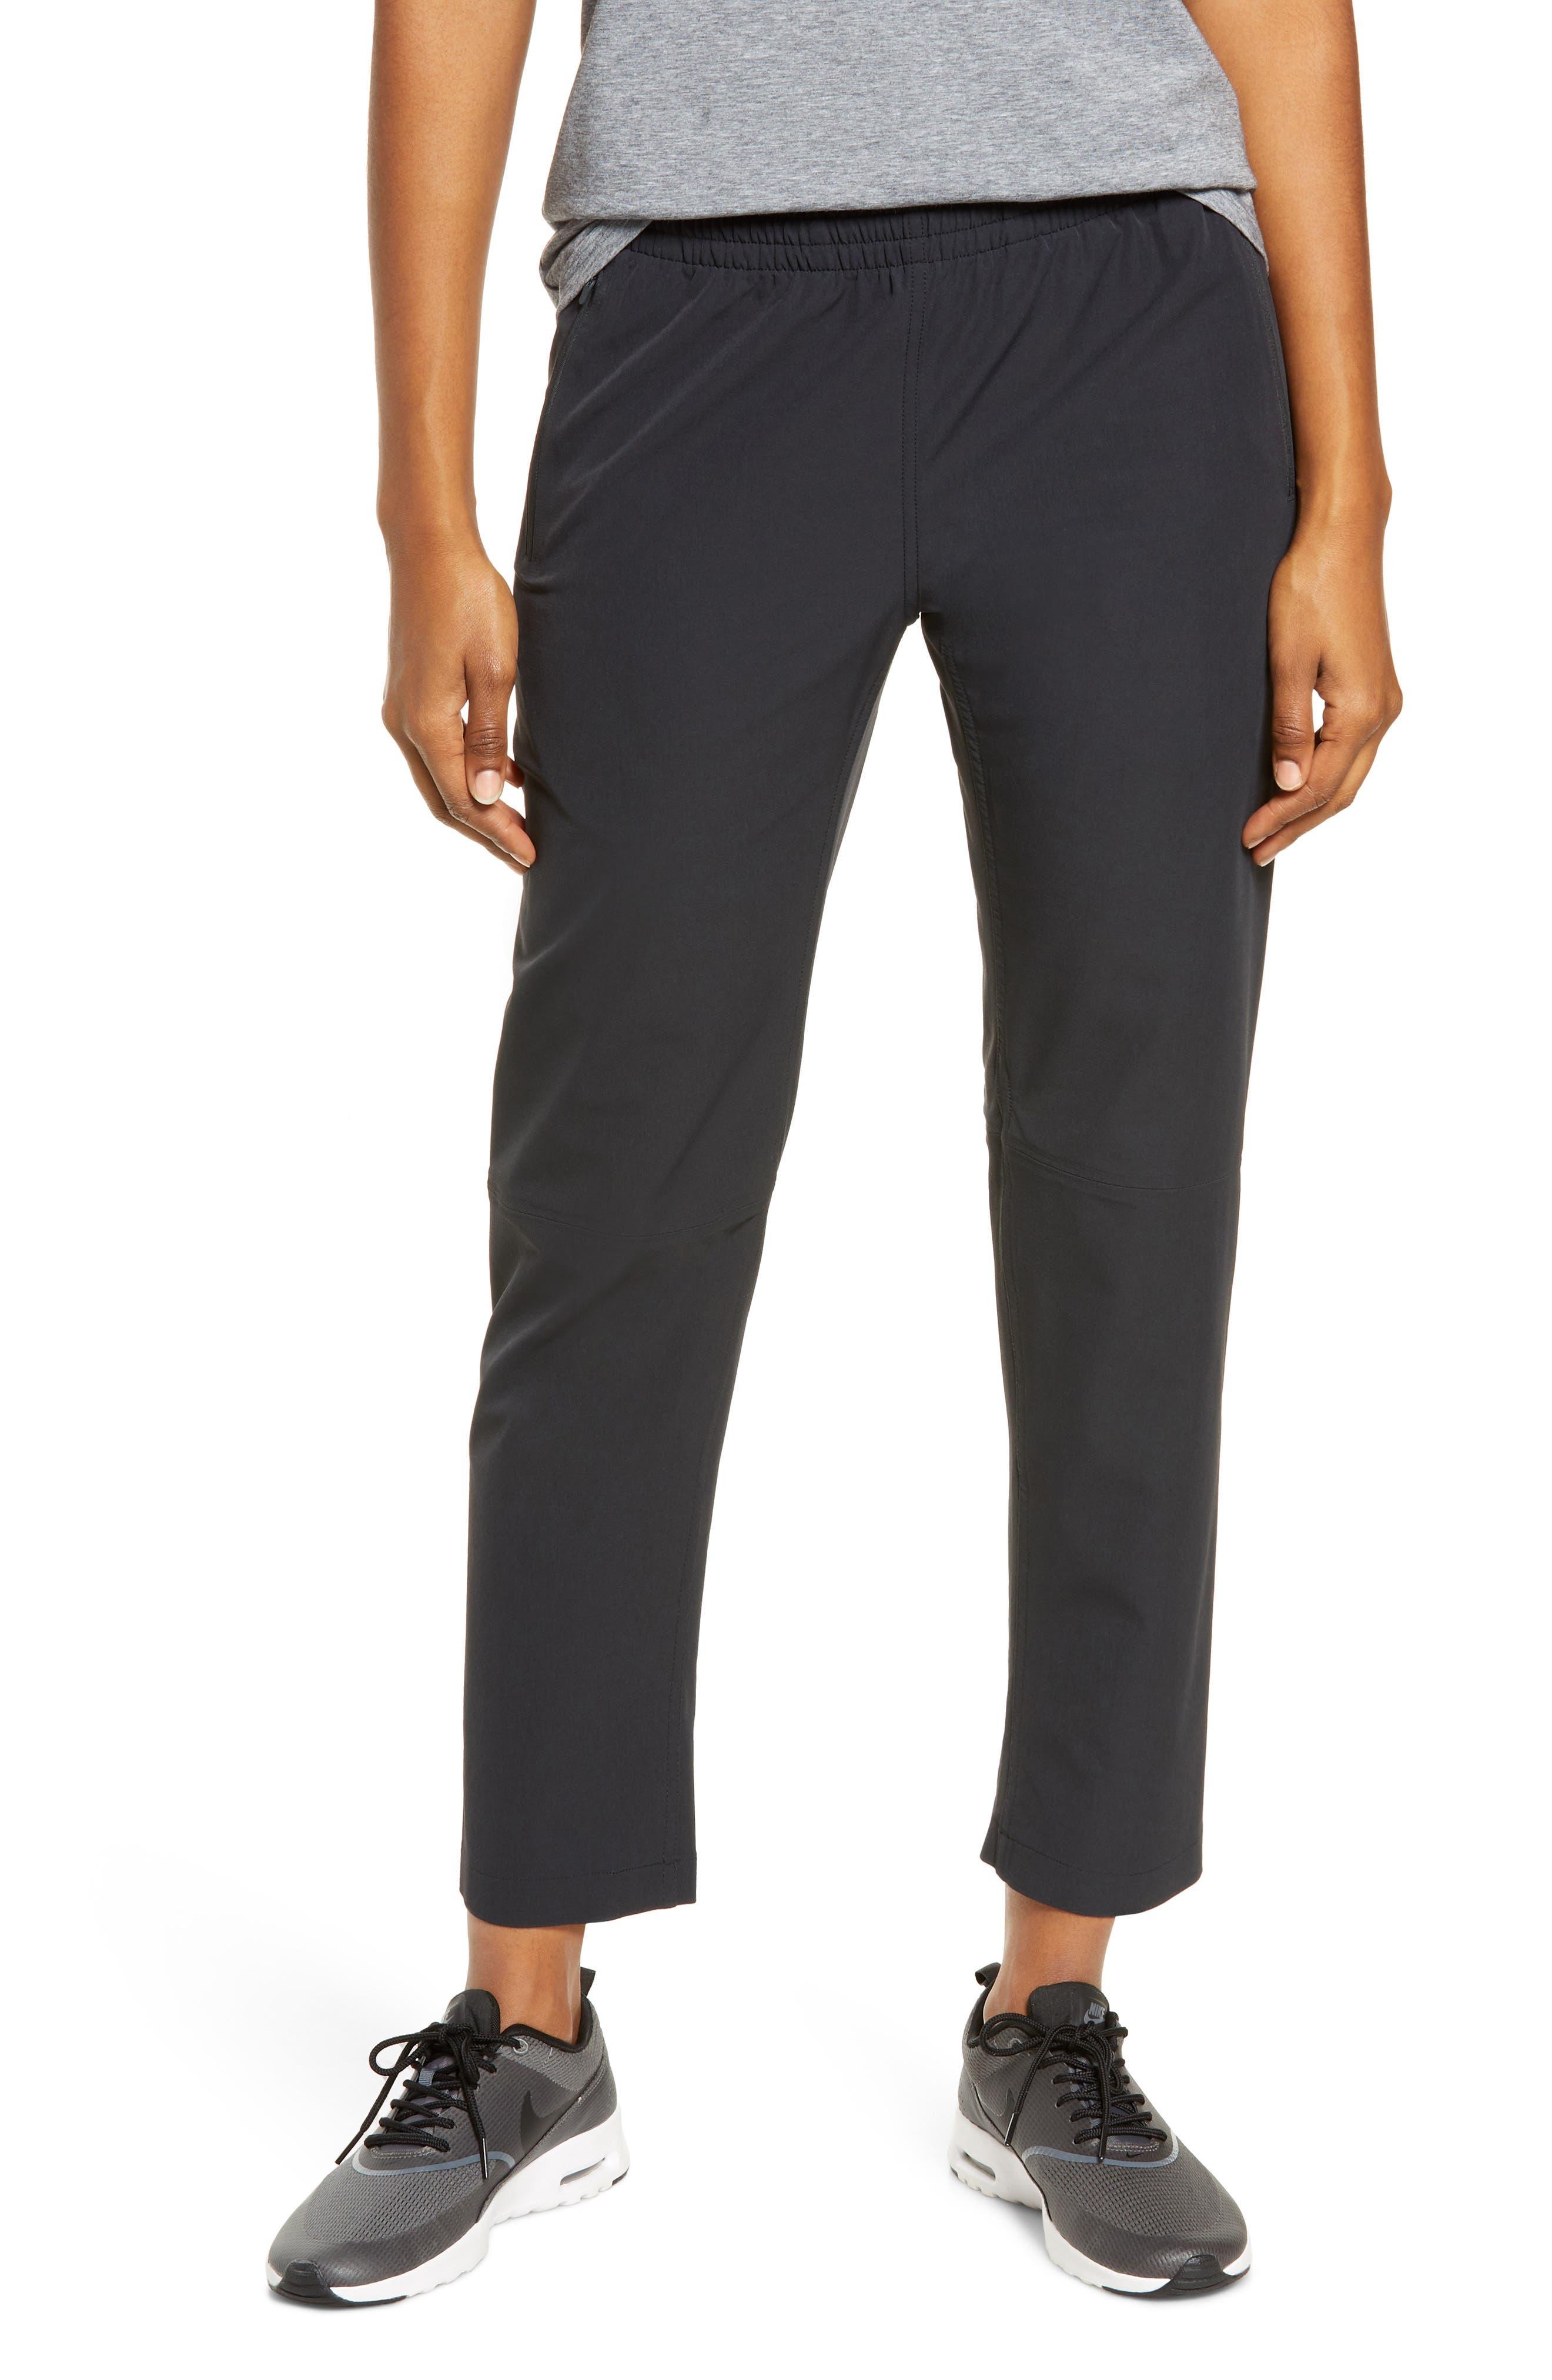 Outdoor Voices Women's Outdoor Voices Rectrek Pocket Ankle Pants, Size X-Large - Black